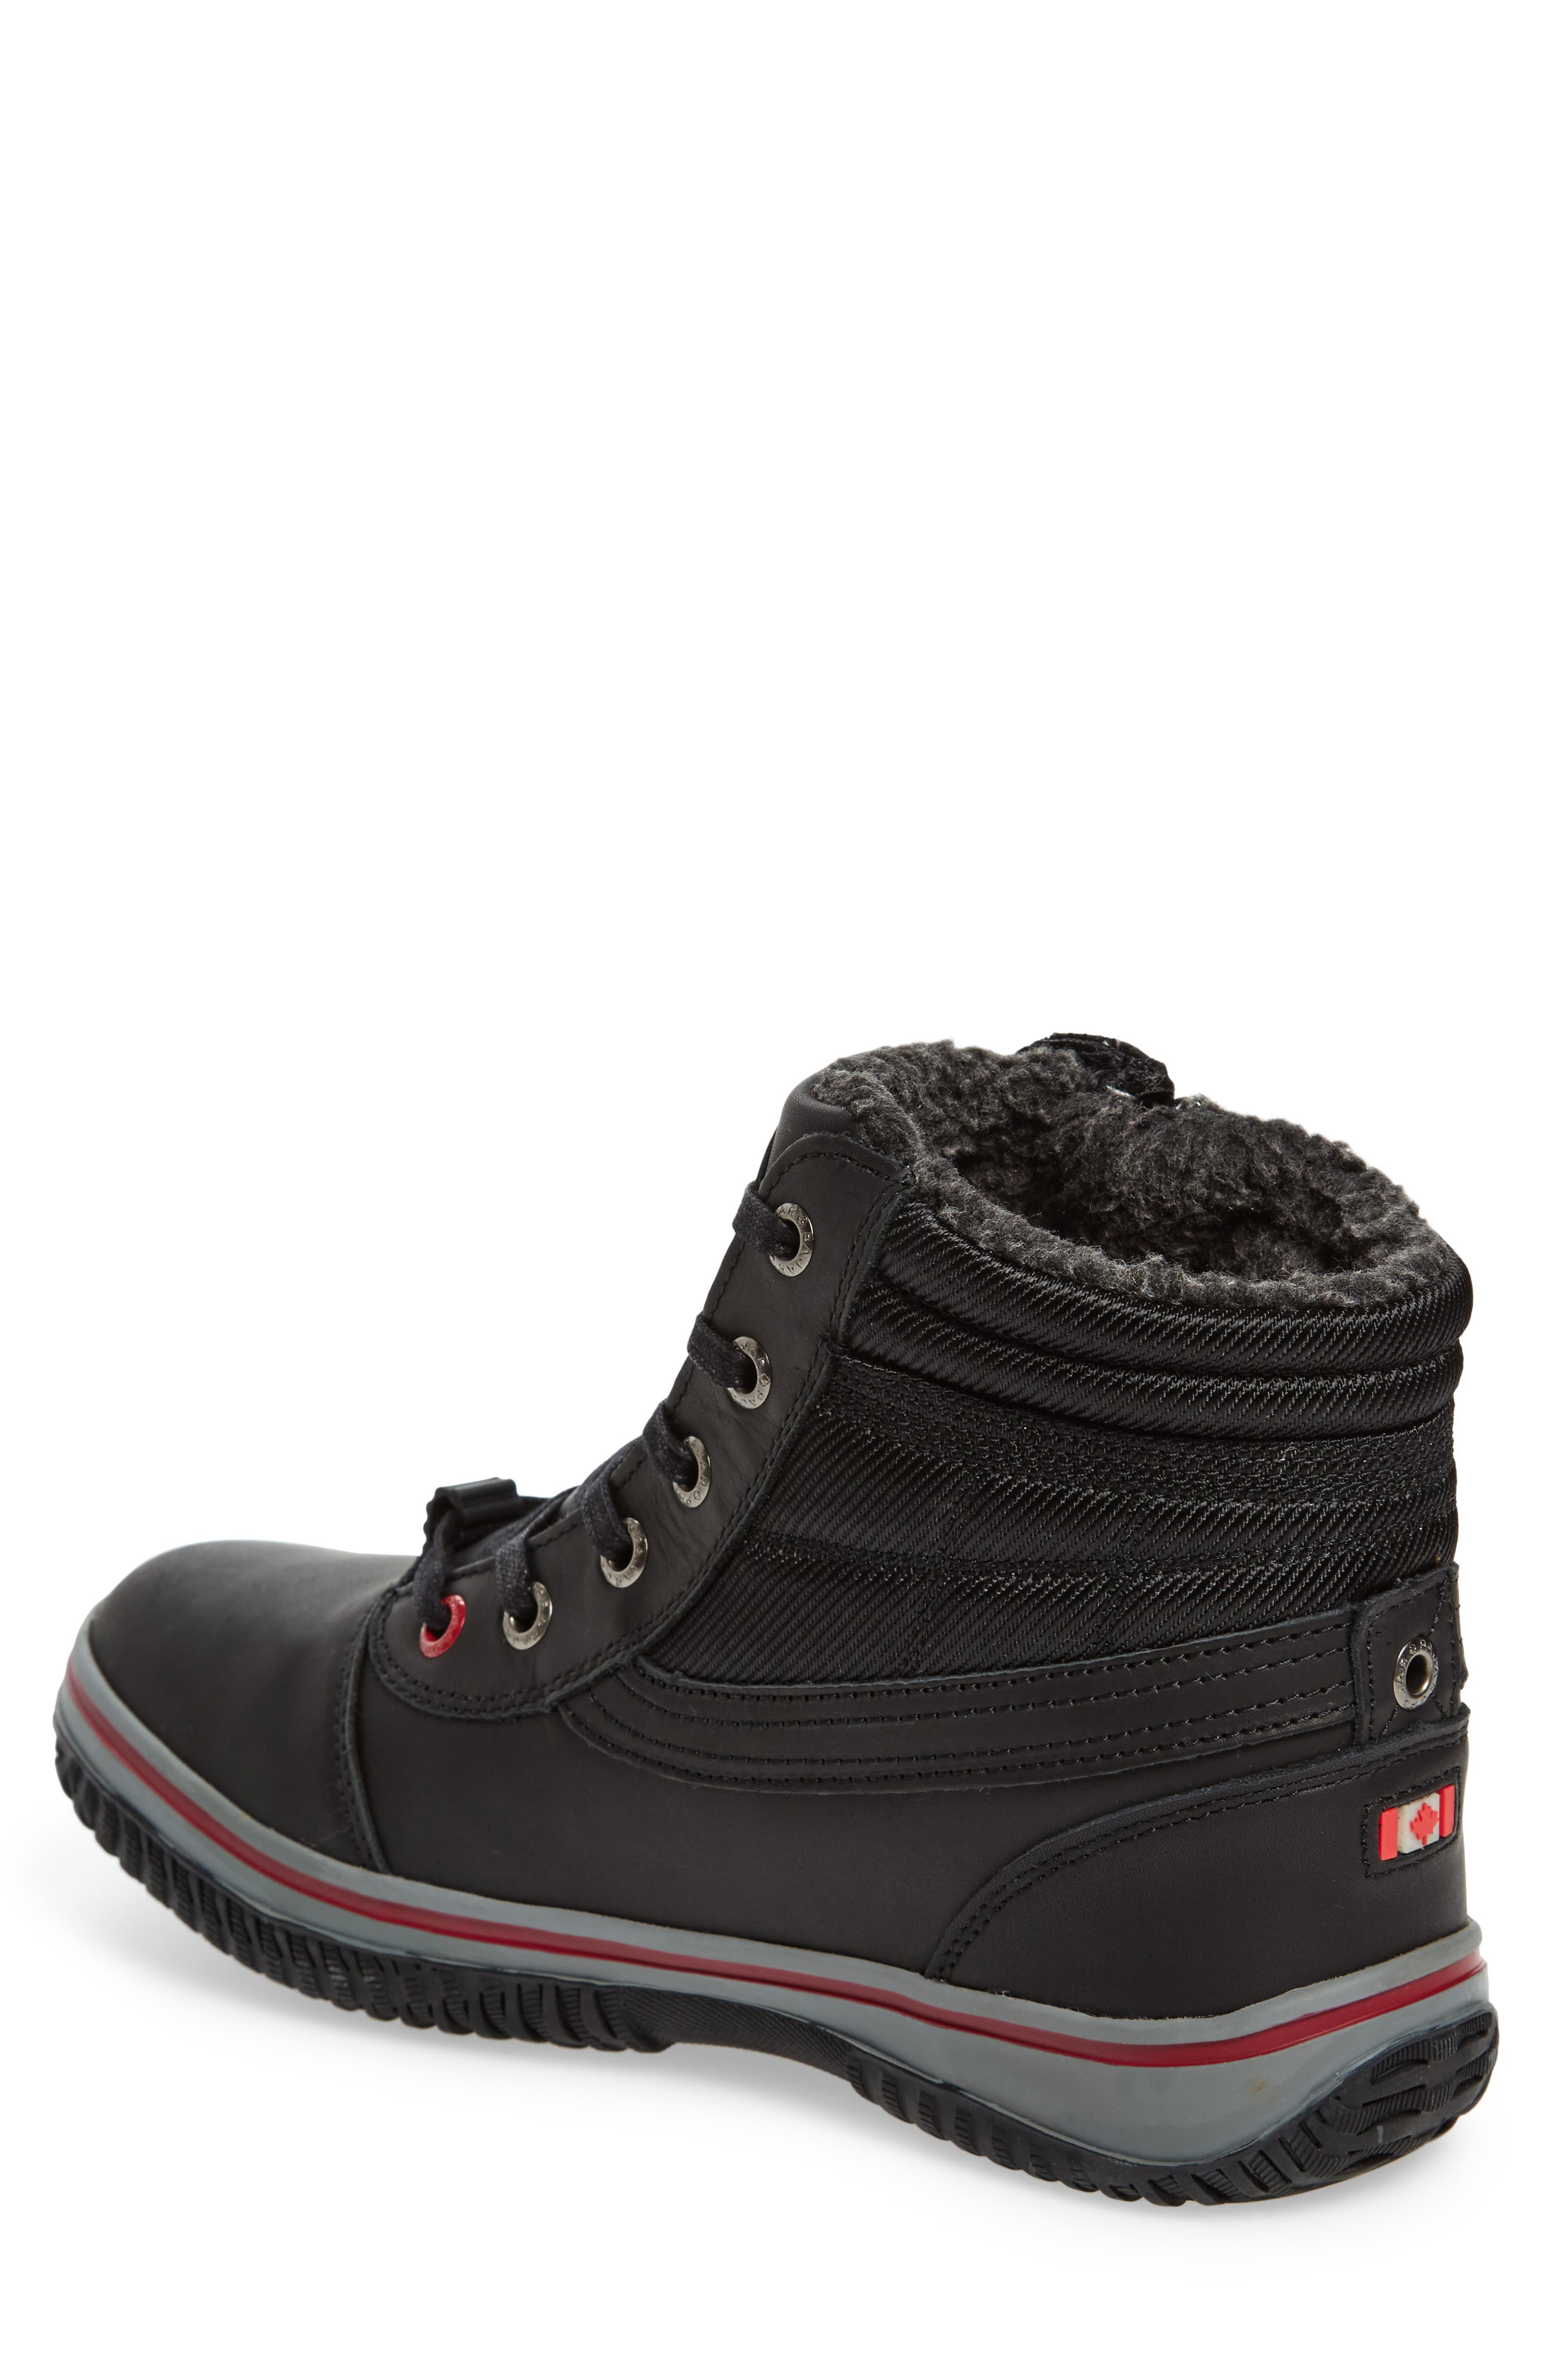 Tavin Waterproof Winter Boot,                             Alternate thumbnail 2, color,                             001